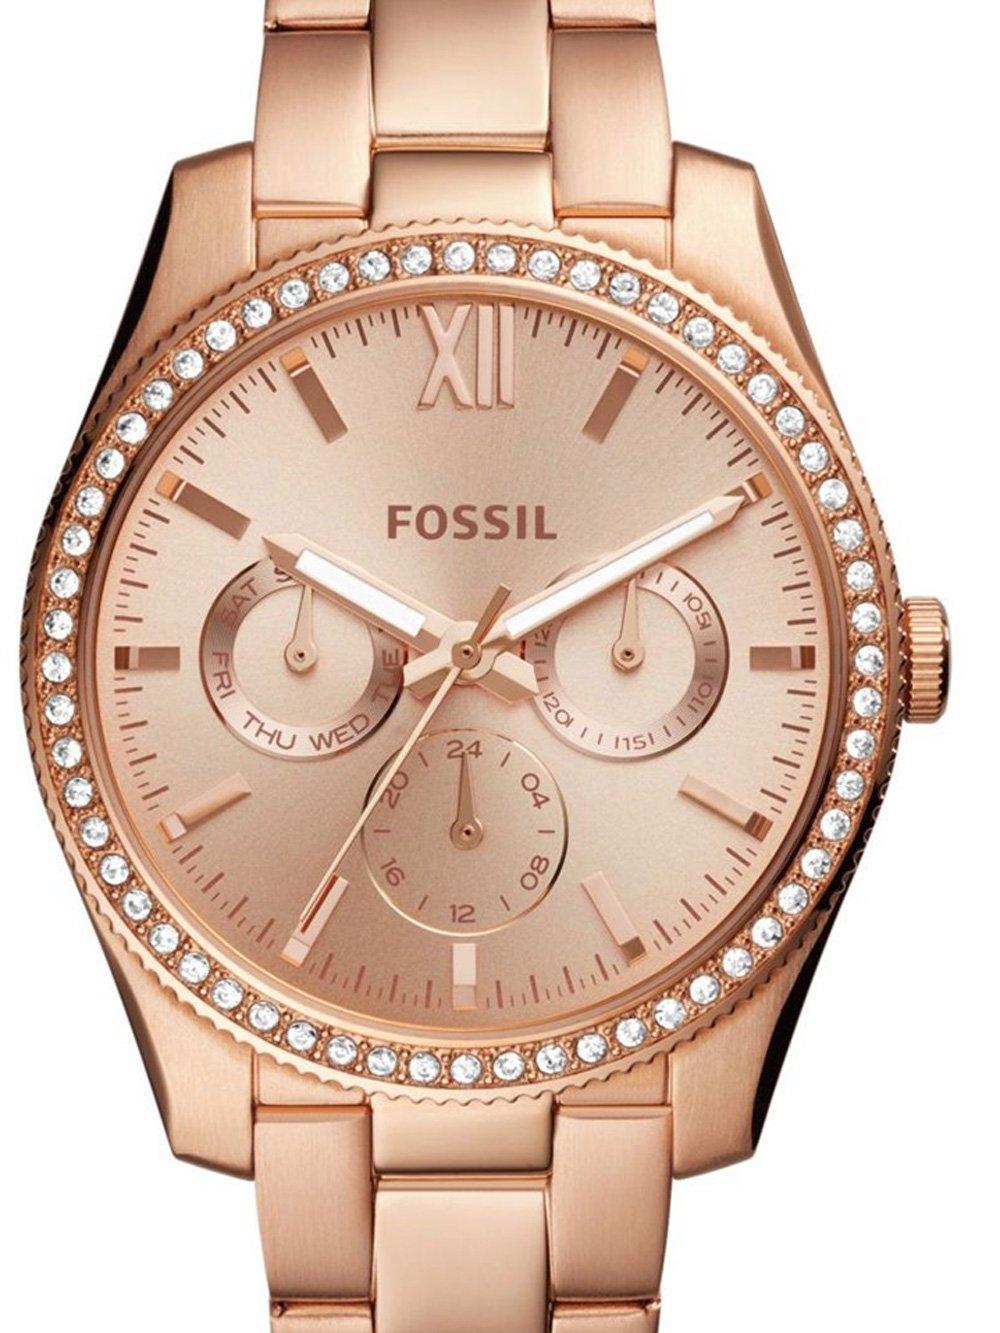 watches chrono12 fossil es4315 scarlette damen 38mm 5atm. Black Bedroom Furniture Sets. Home Design Ideas